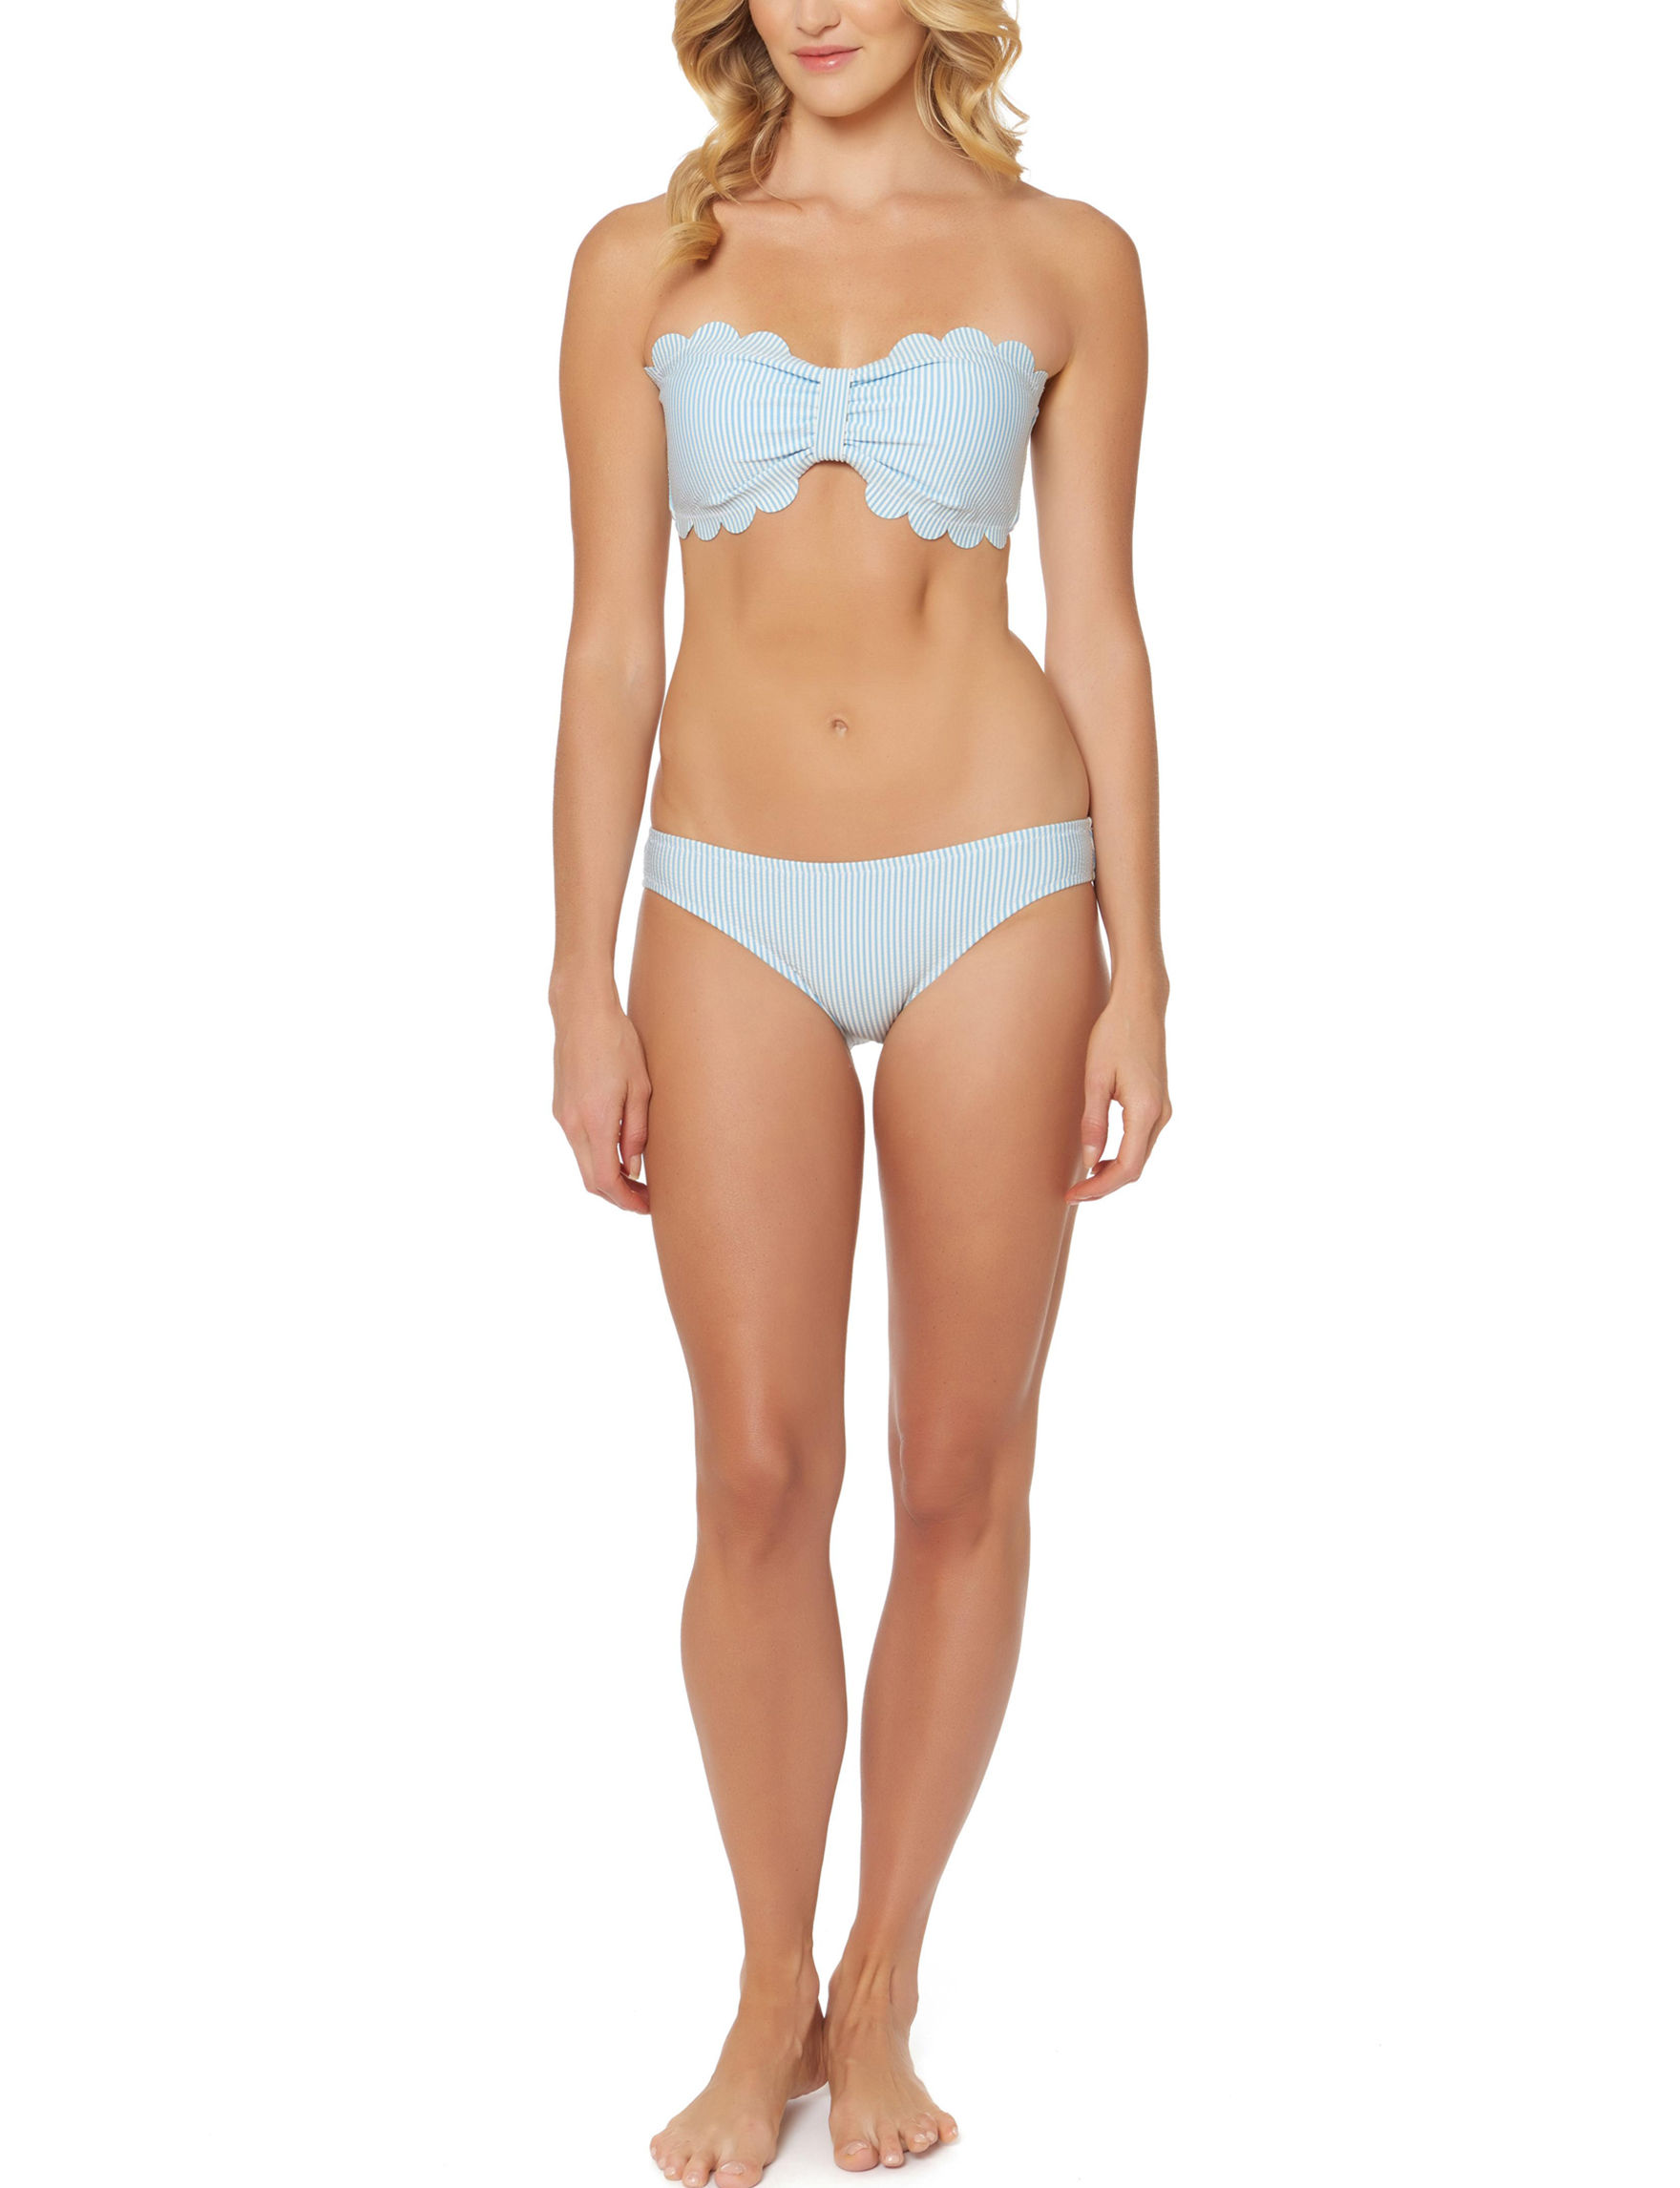 Jessica Simpson Blue Swimsuit Tops Bandeau